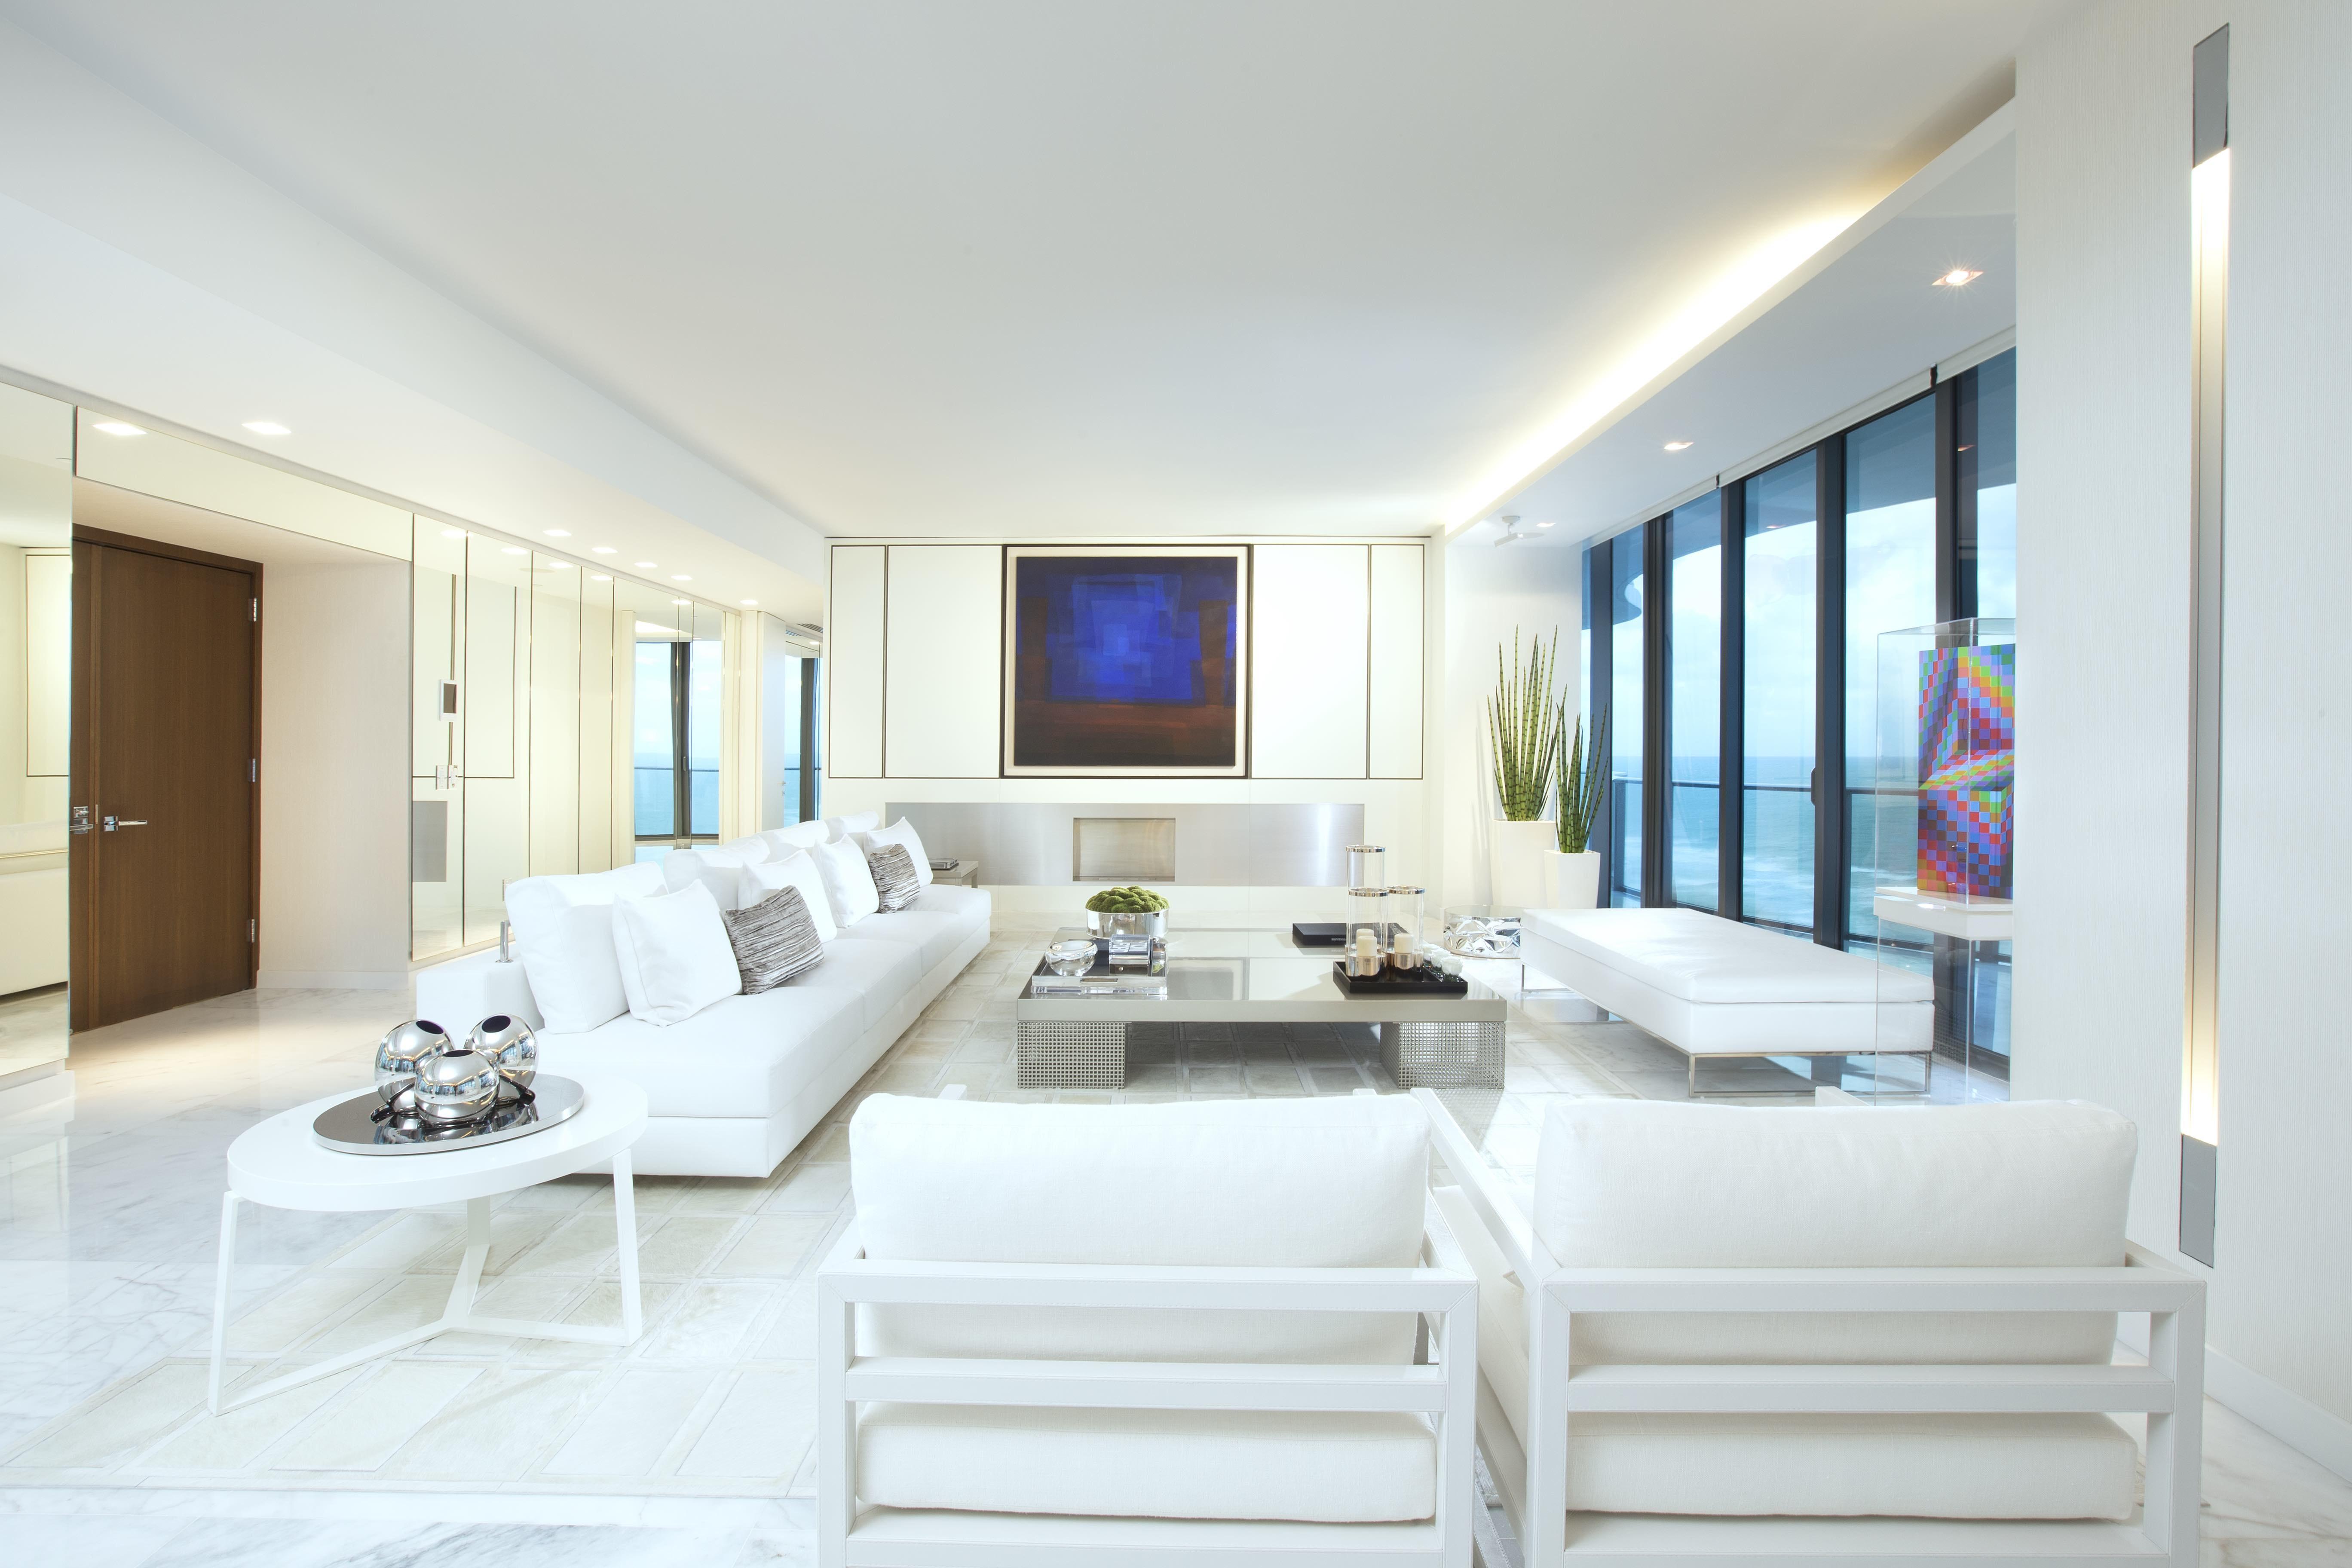 Beau Miami Interior Designers   Residential Interior Design Project In Miami,  FL. Regalia Is An